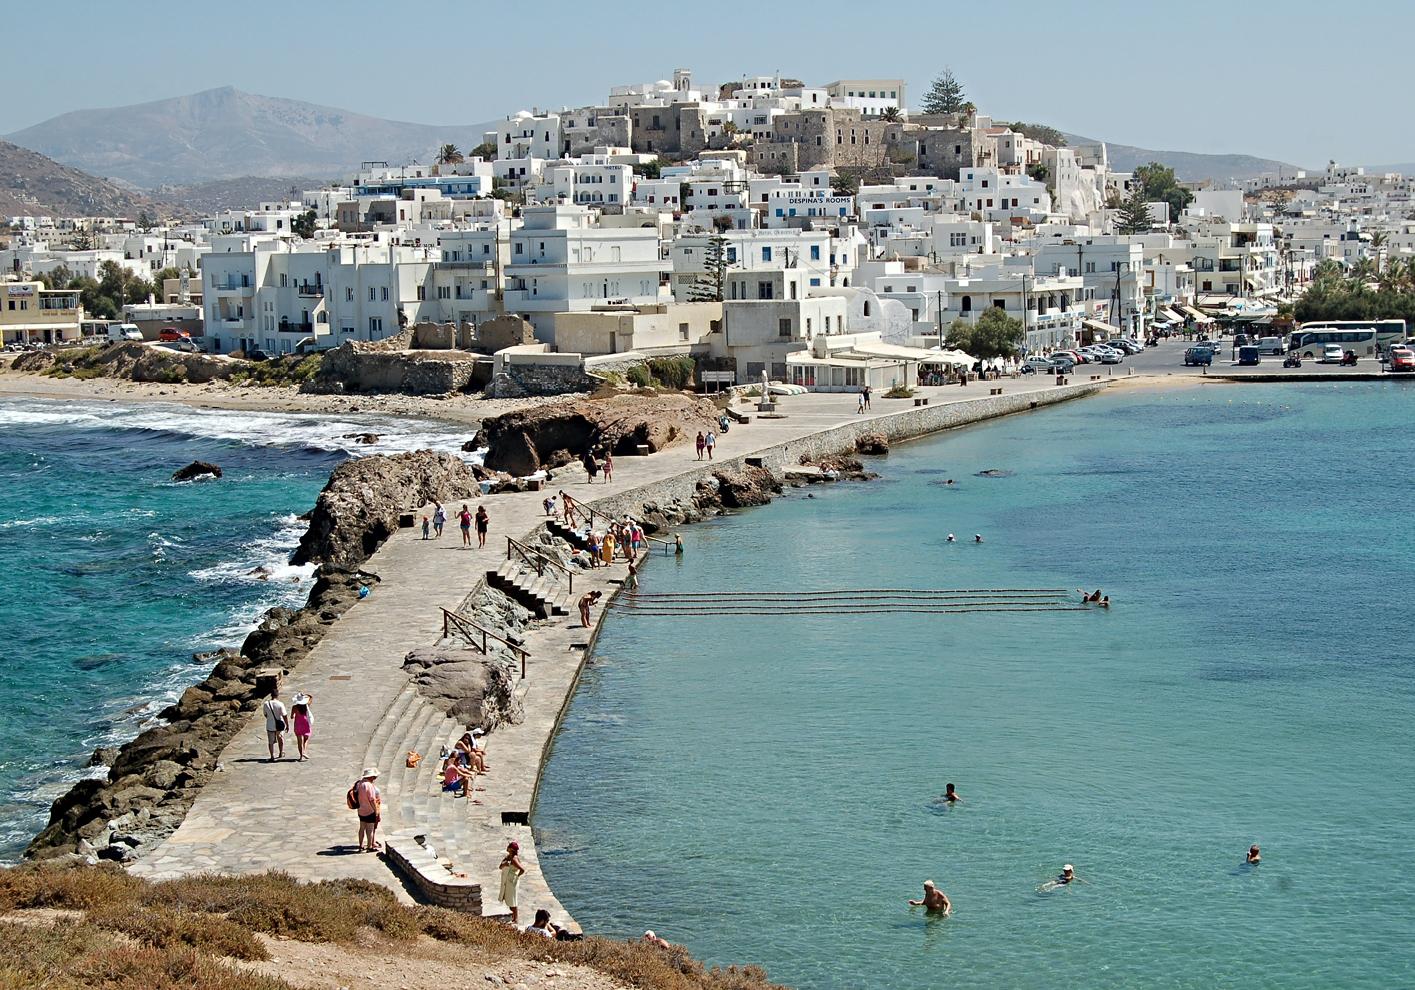 Margarita Skarkou grew up on the island of Naxos, Greece. Photograph: Chris Barbalis